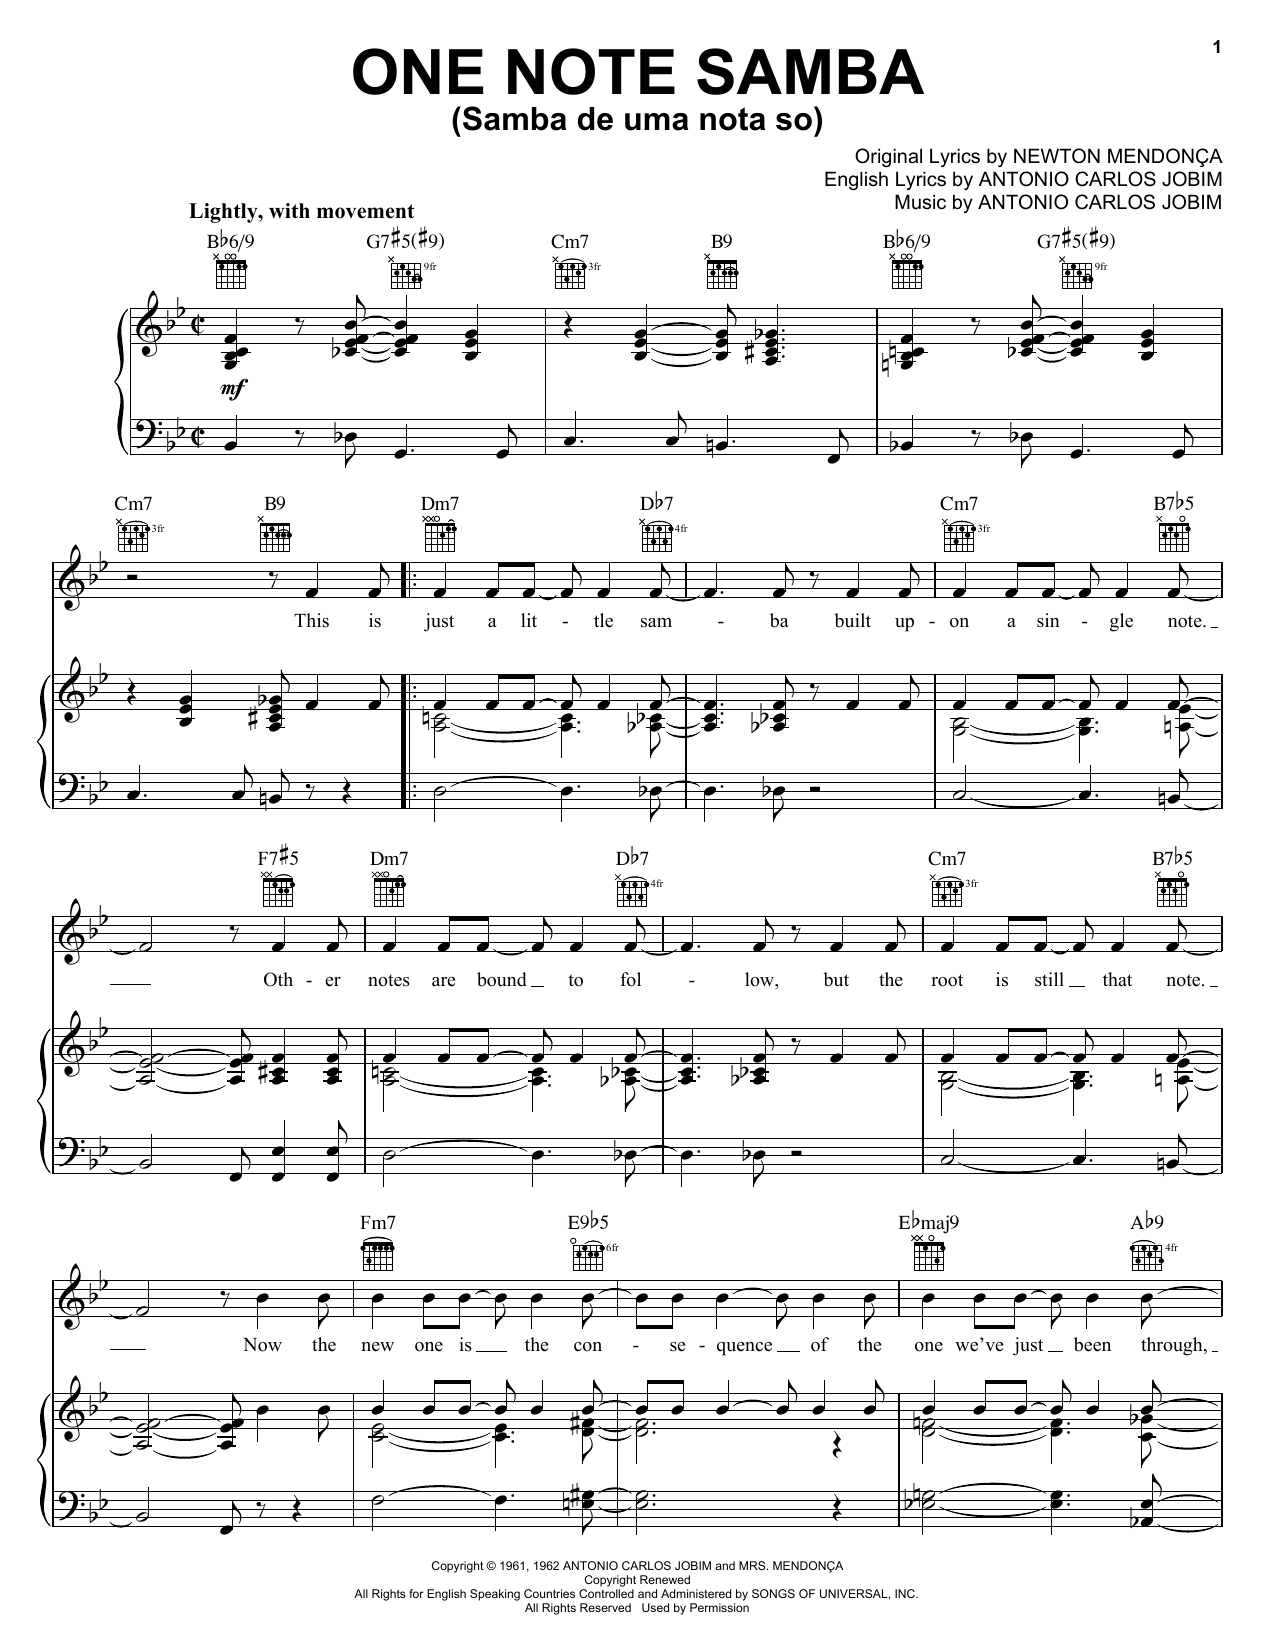 One Note Samba (Samba De Uma Nota So) Sheet Music